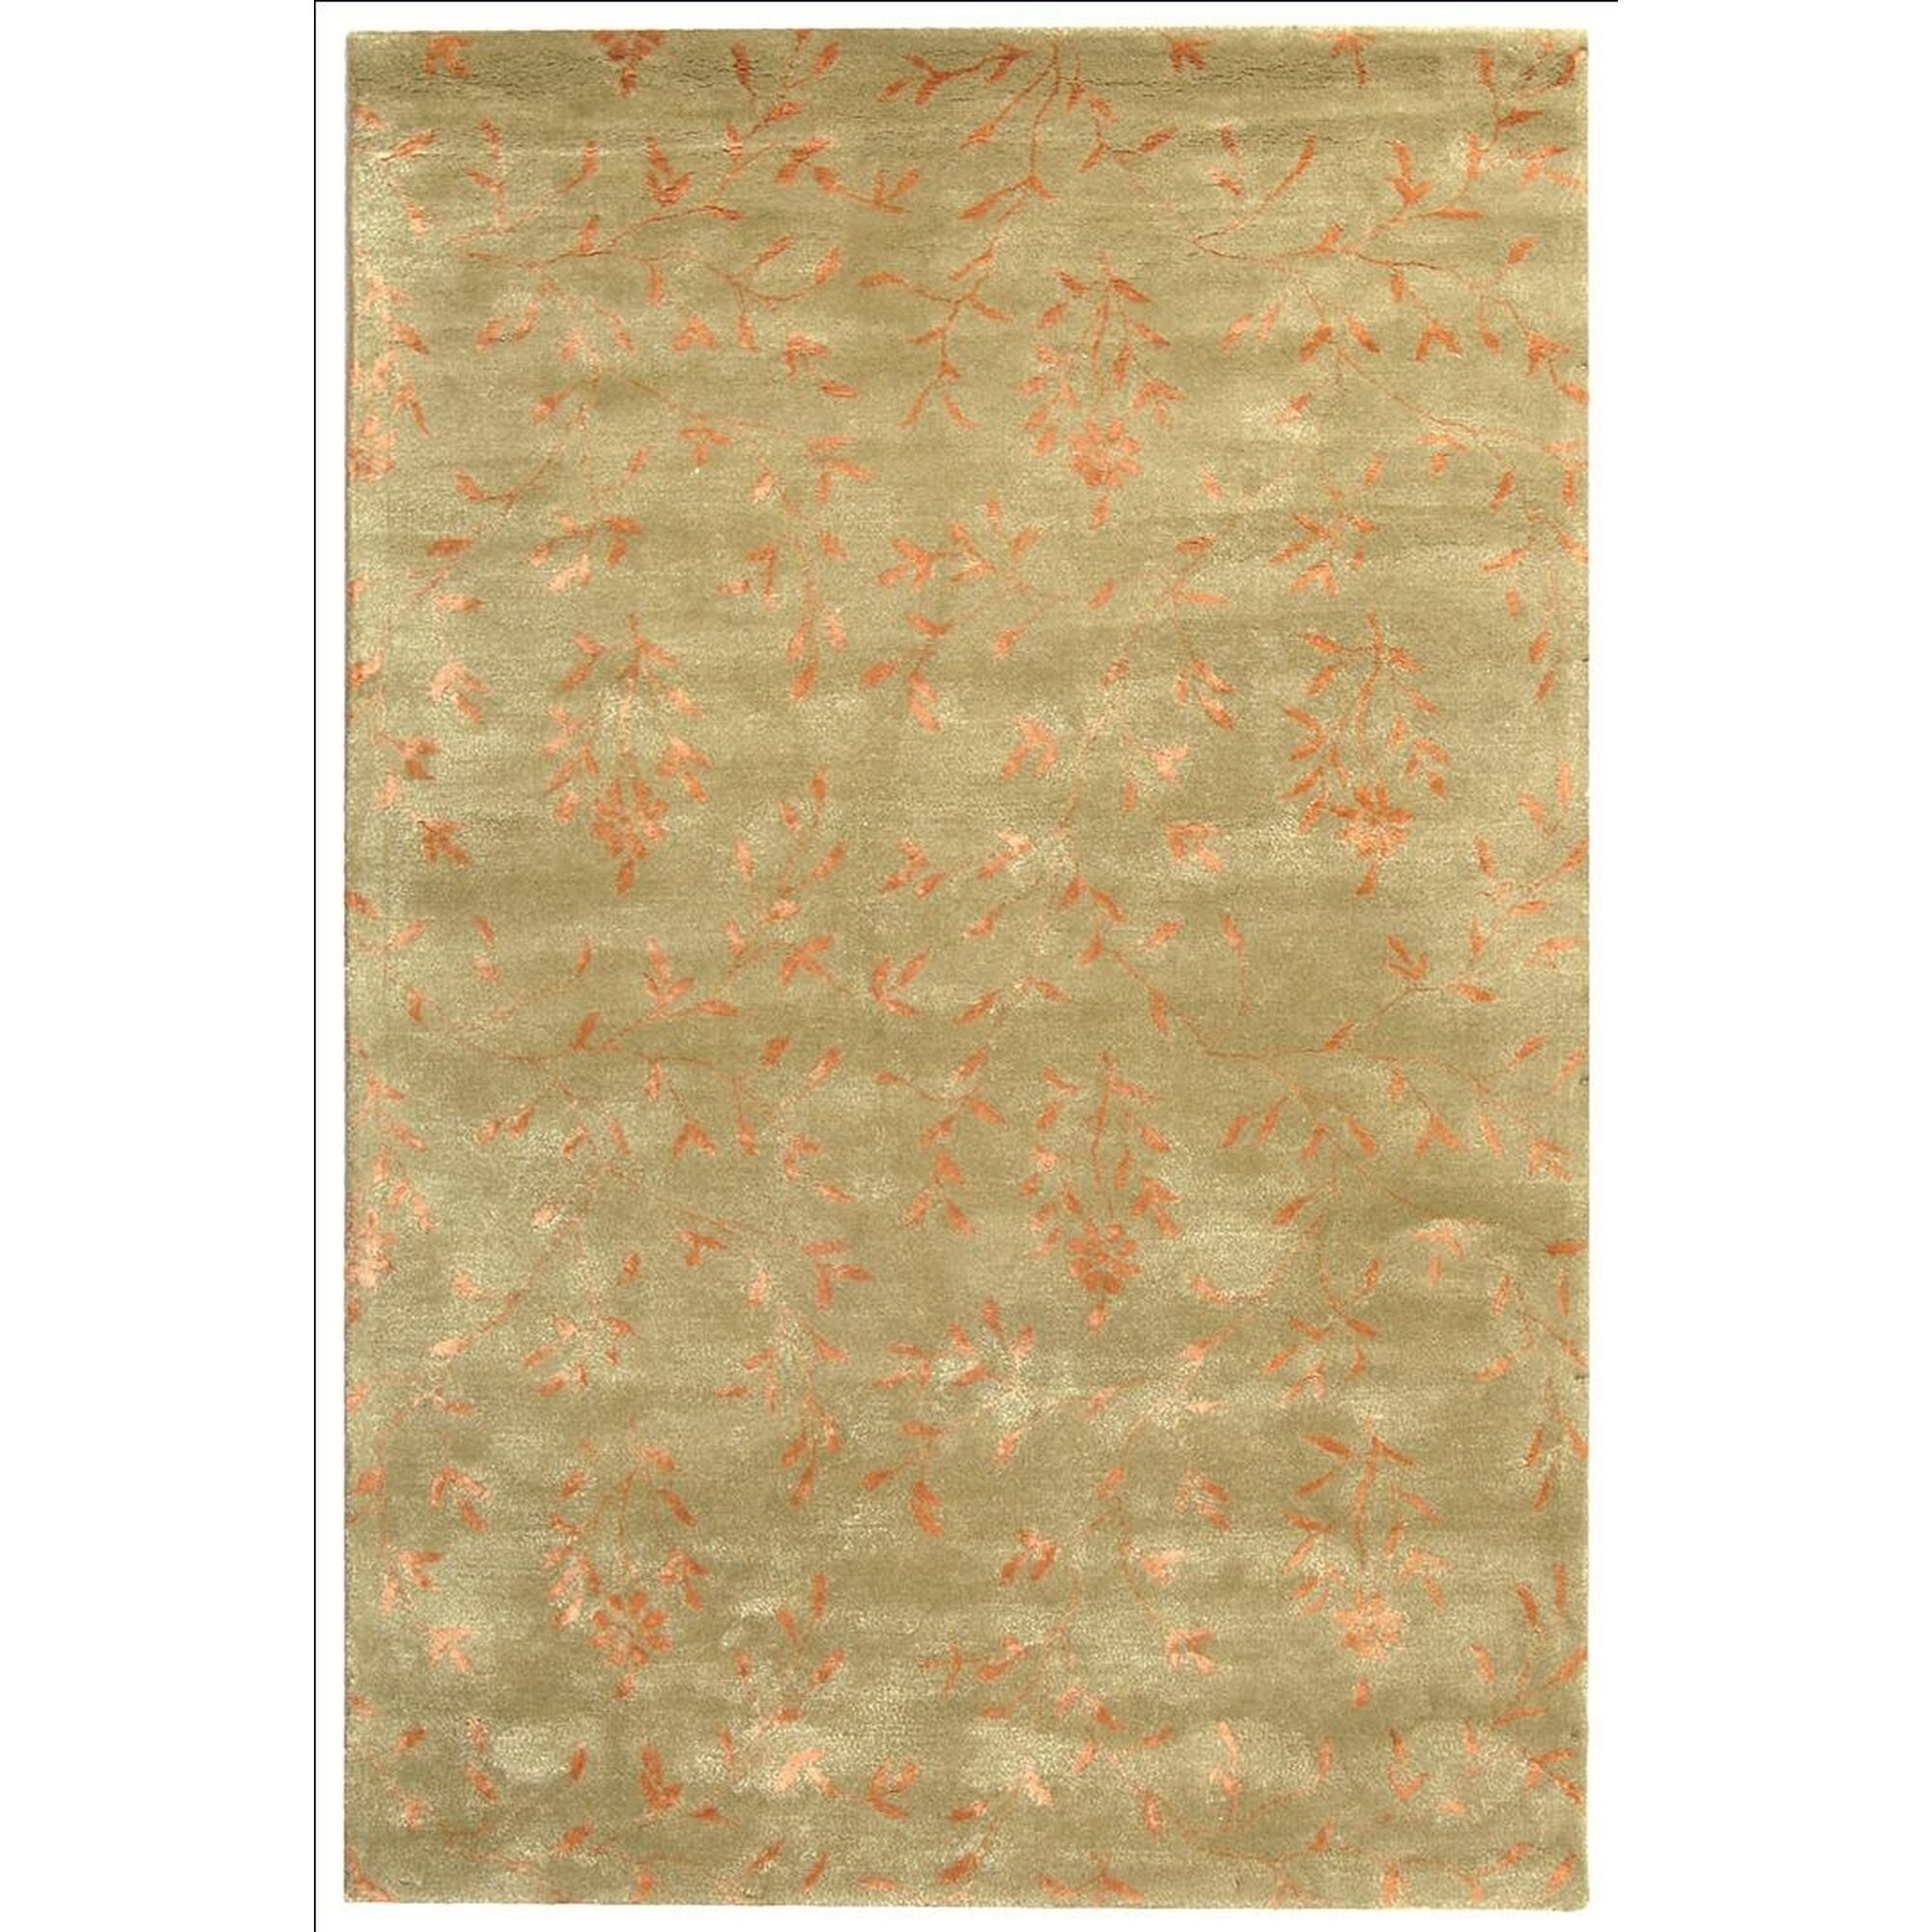 Blandinsville Hand-Tufted Sage/Rust Area Rug Rug Size: Rectangle 7'6